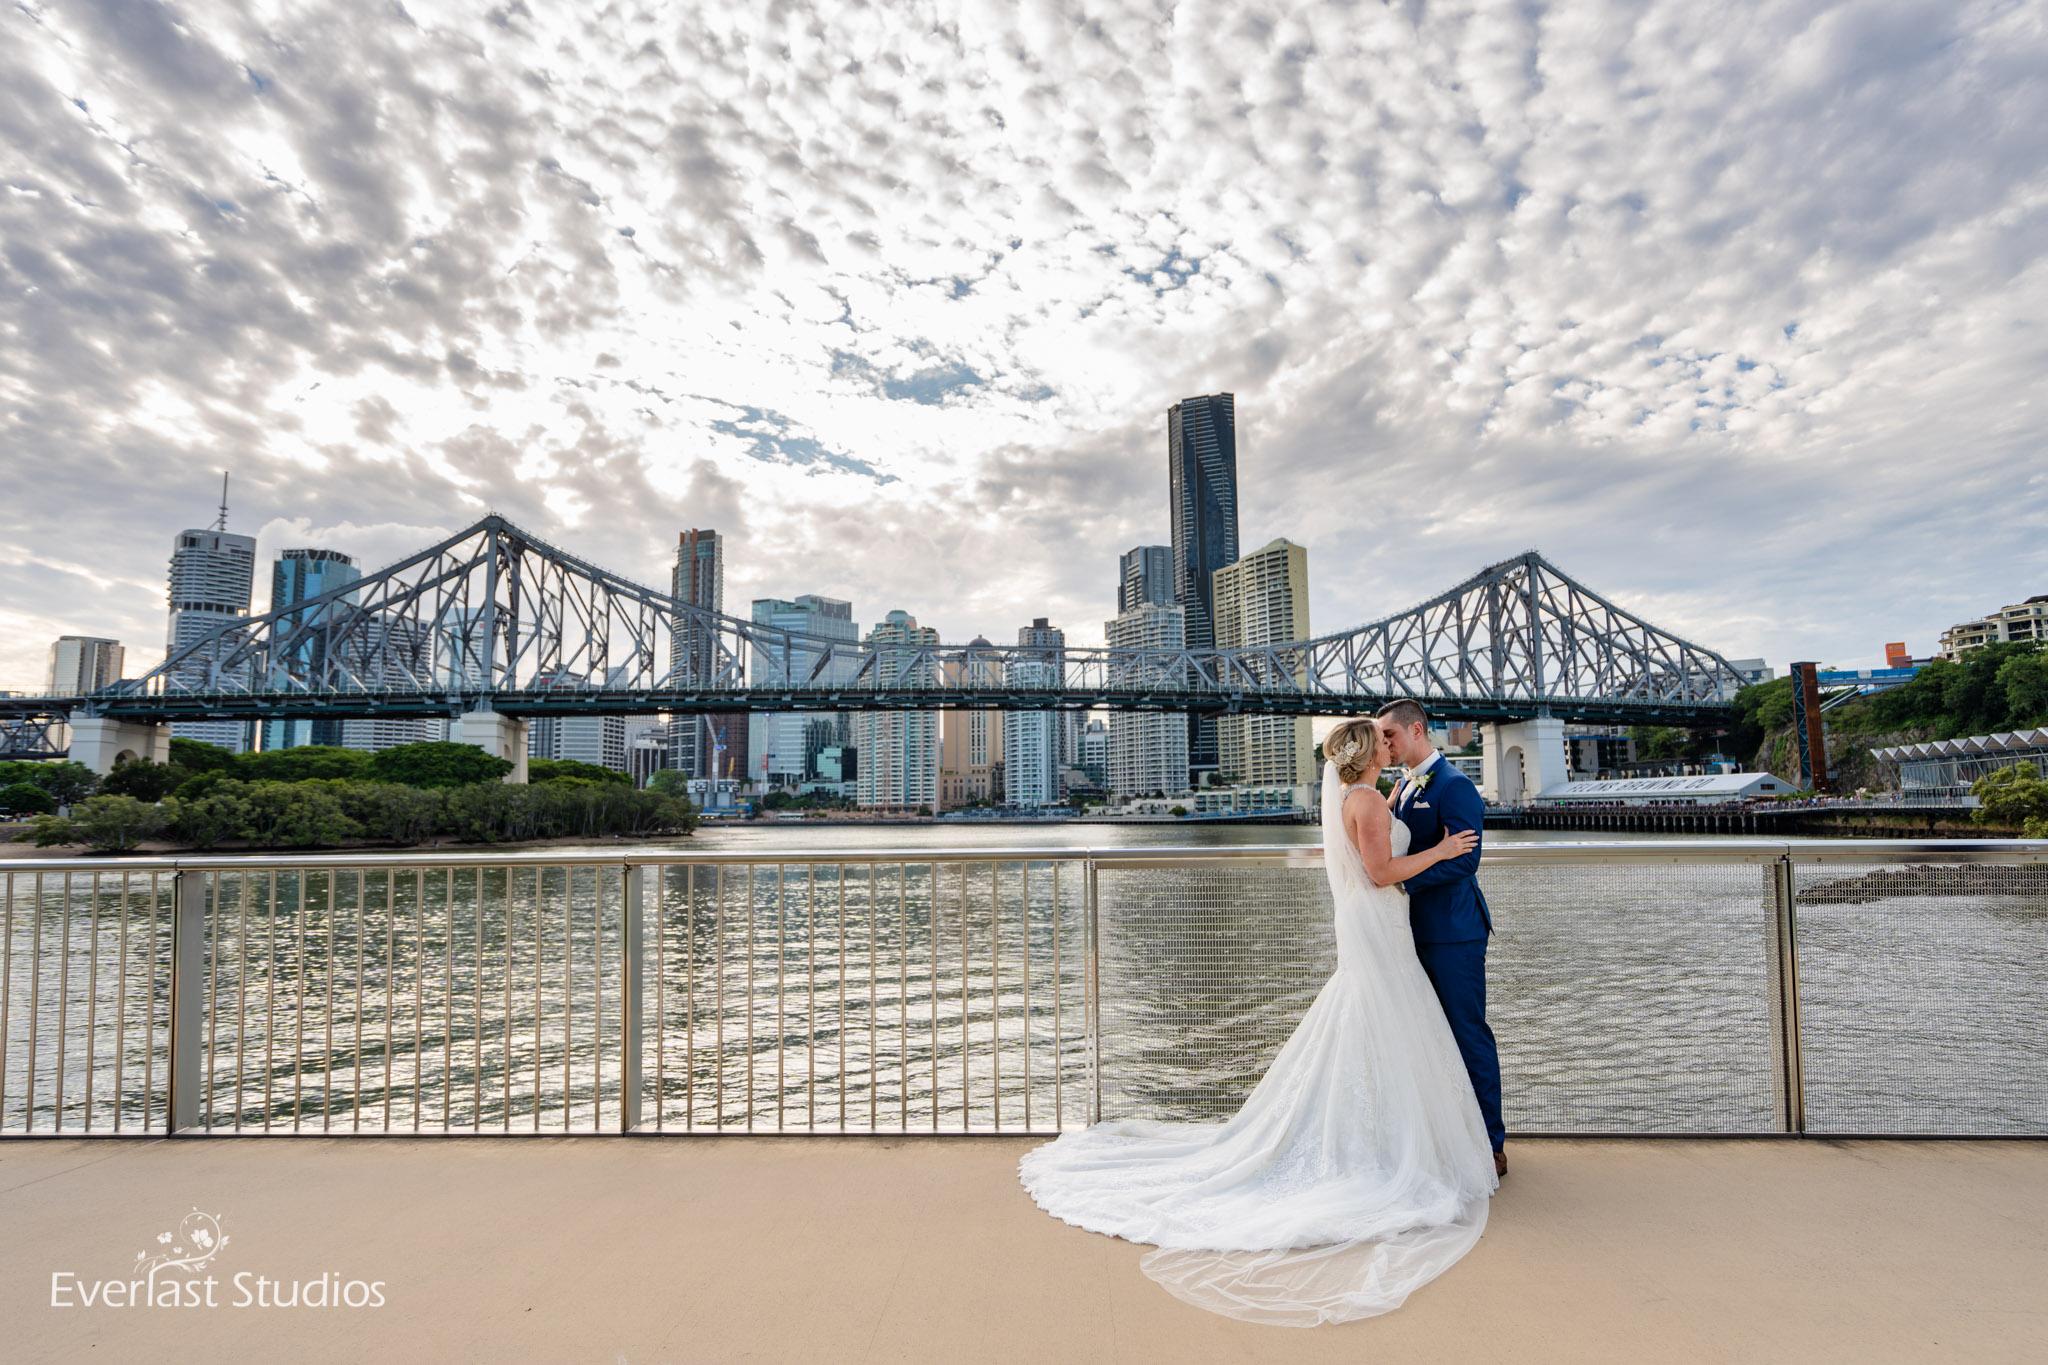 Wedding photos at story bridge, Brisbane